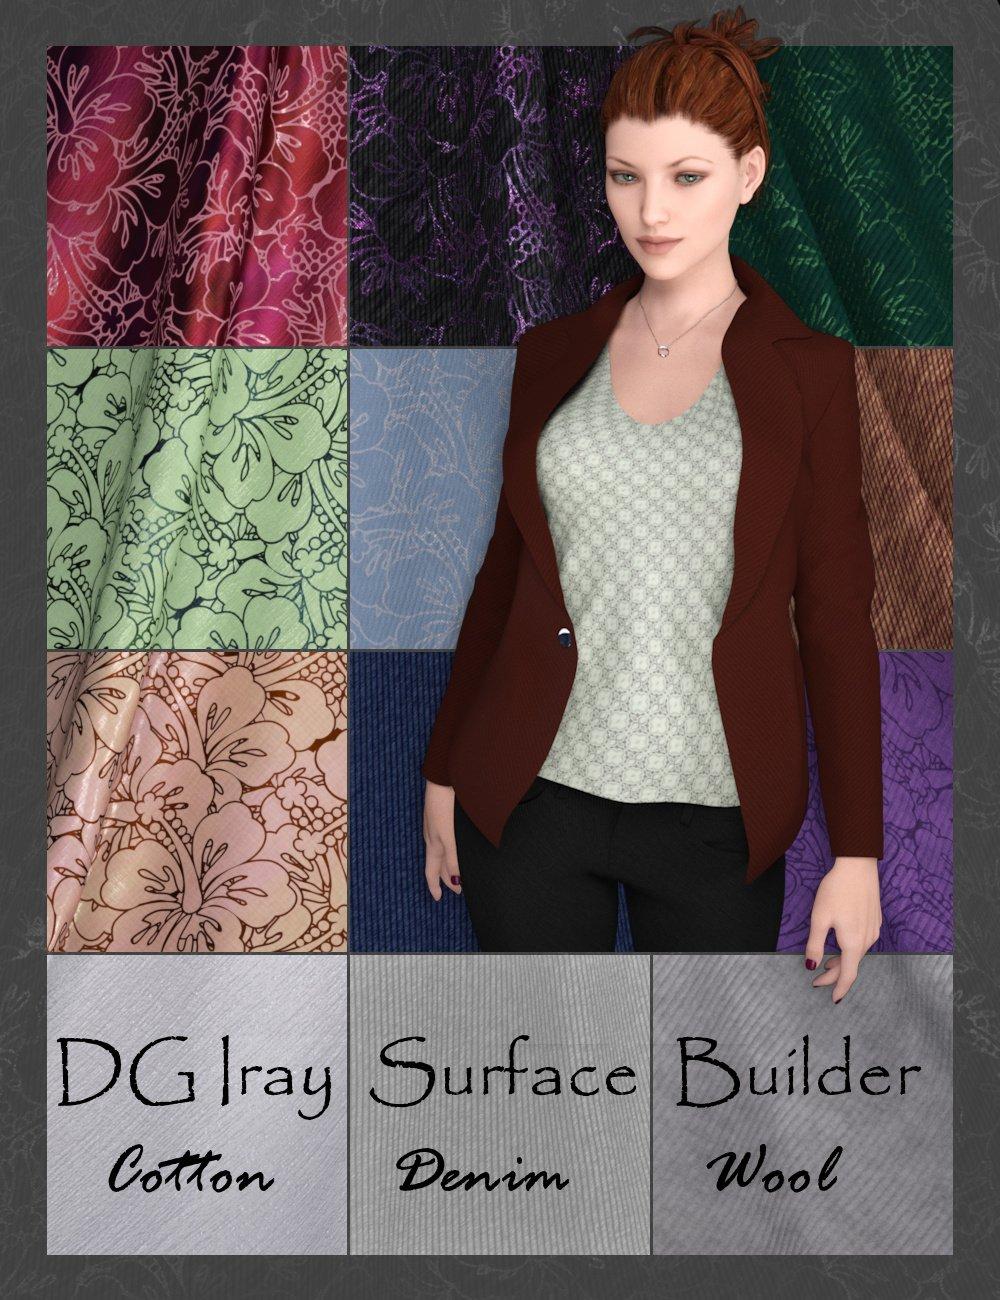 DG Iray Surface Builder - Cotton Denim Wool - Shaders and Merchant Resource by: IDG DesignsDestinysGarden, 3D Models by Daz 3D